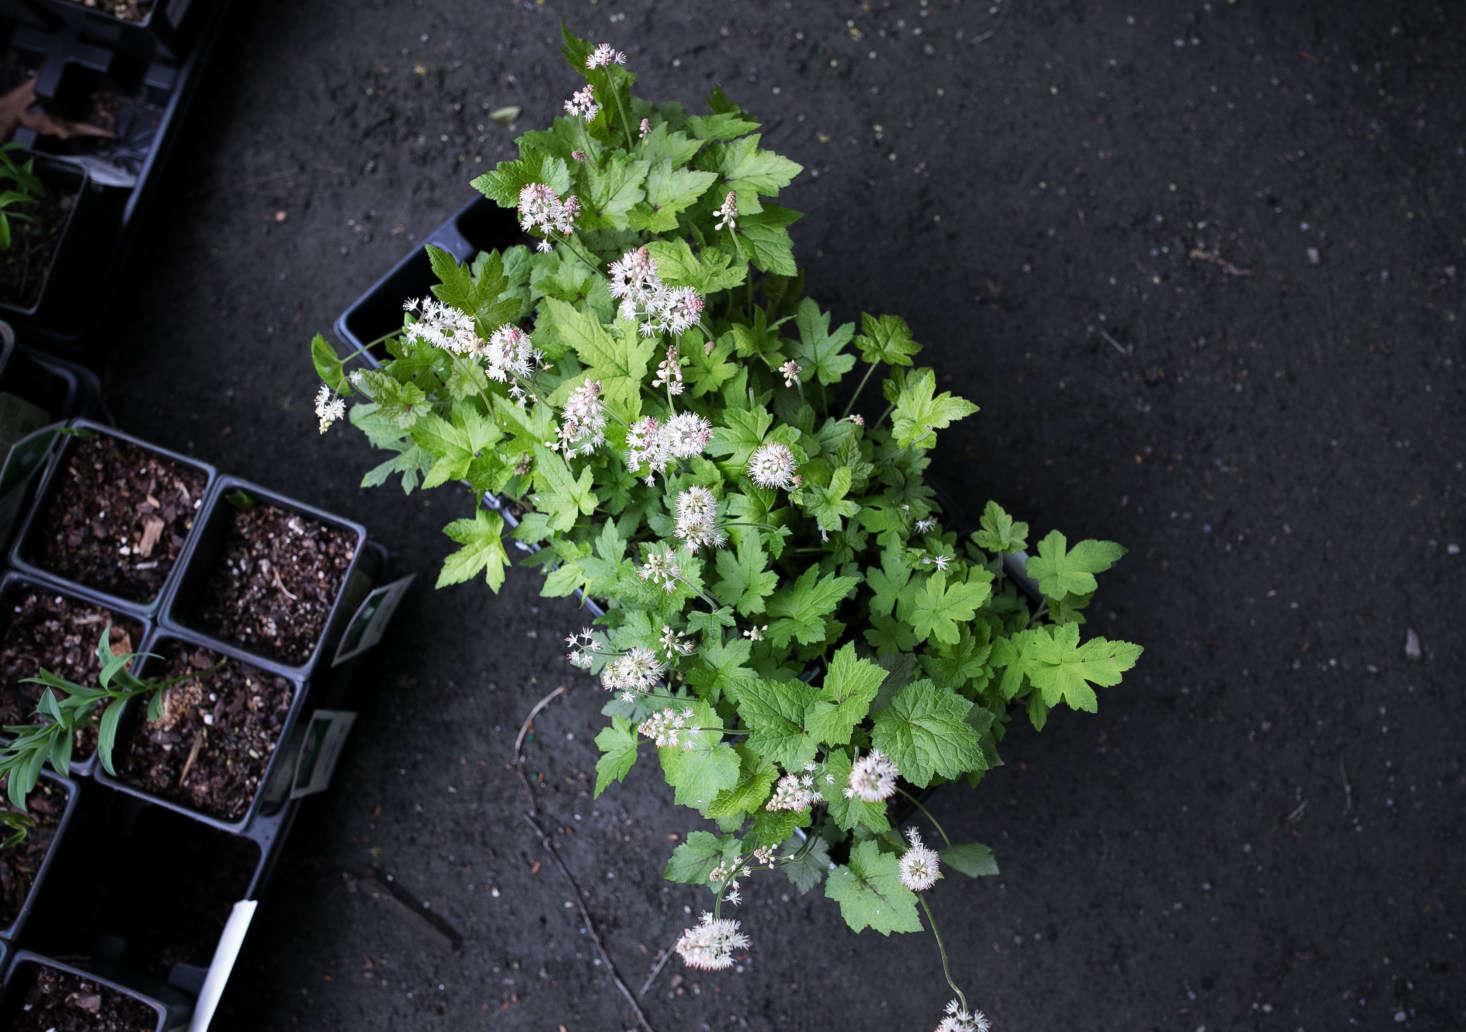 One of my favorites: foamflower, Tiarella cordifolia var. cordifolia makes a happy ground cover in a shade garden.